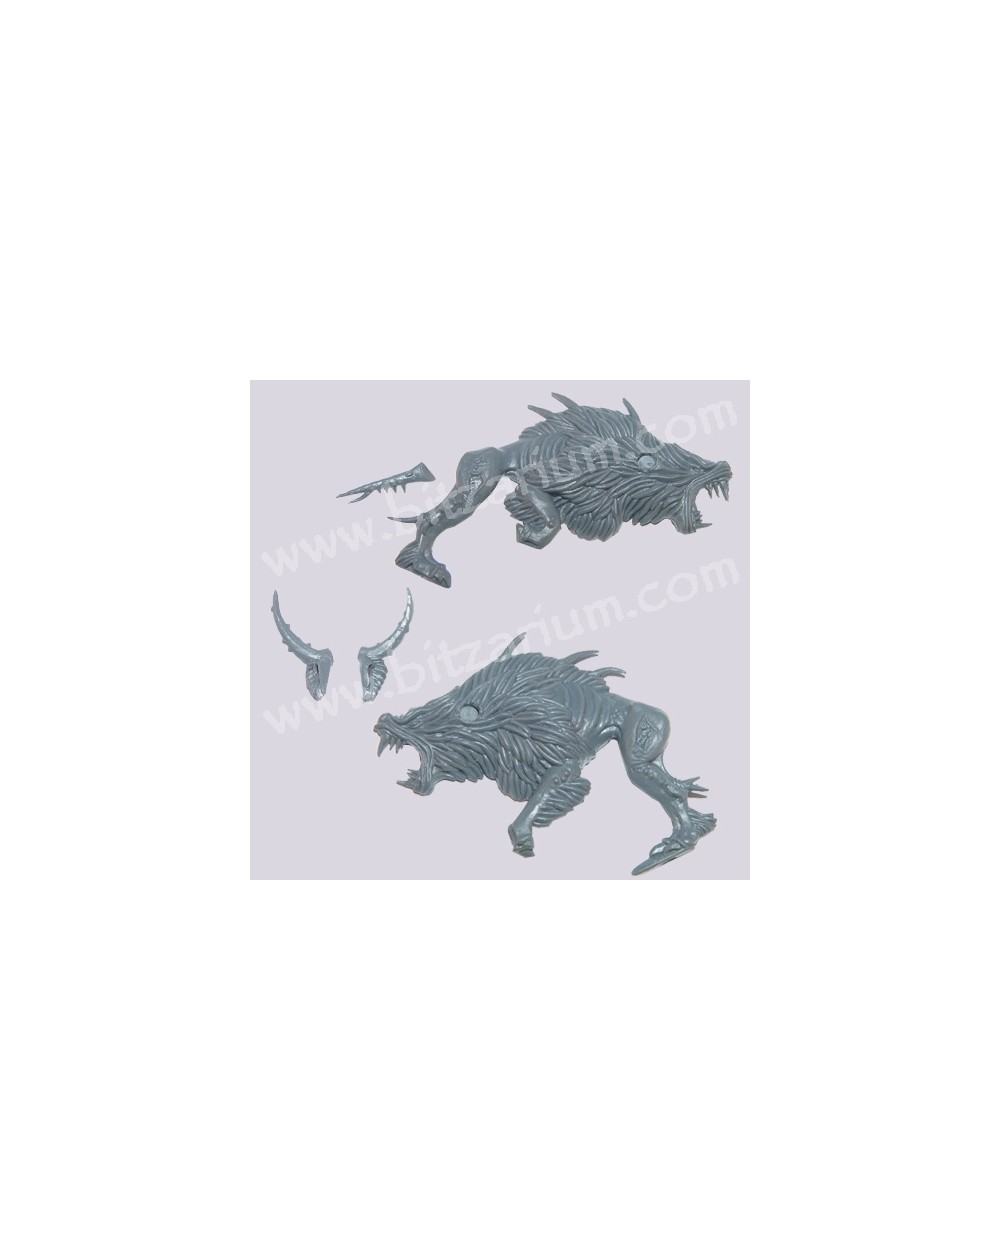 Chaos Warhound 5